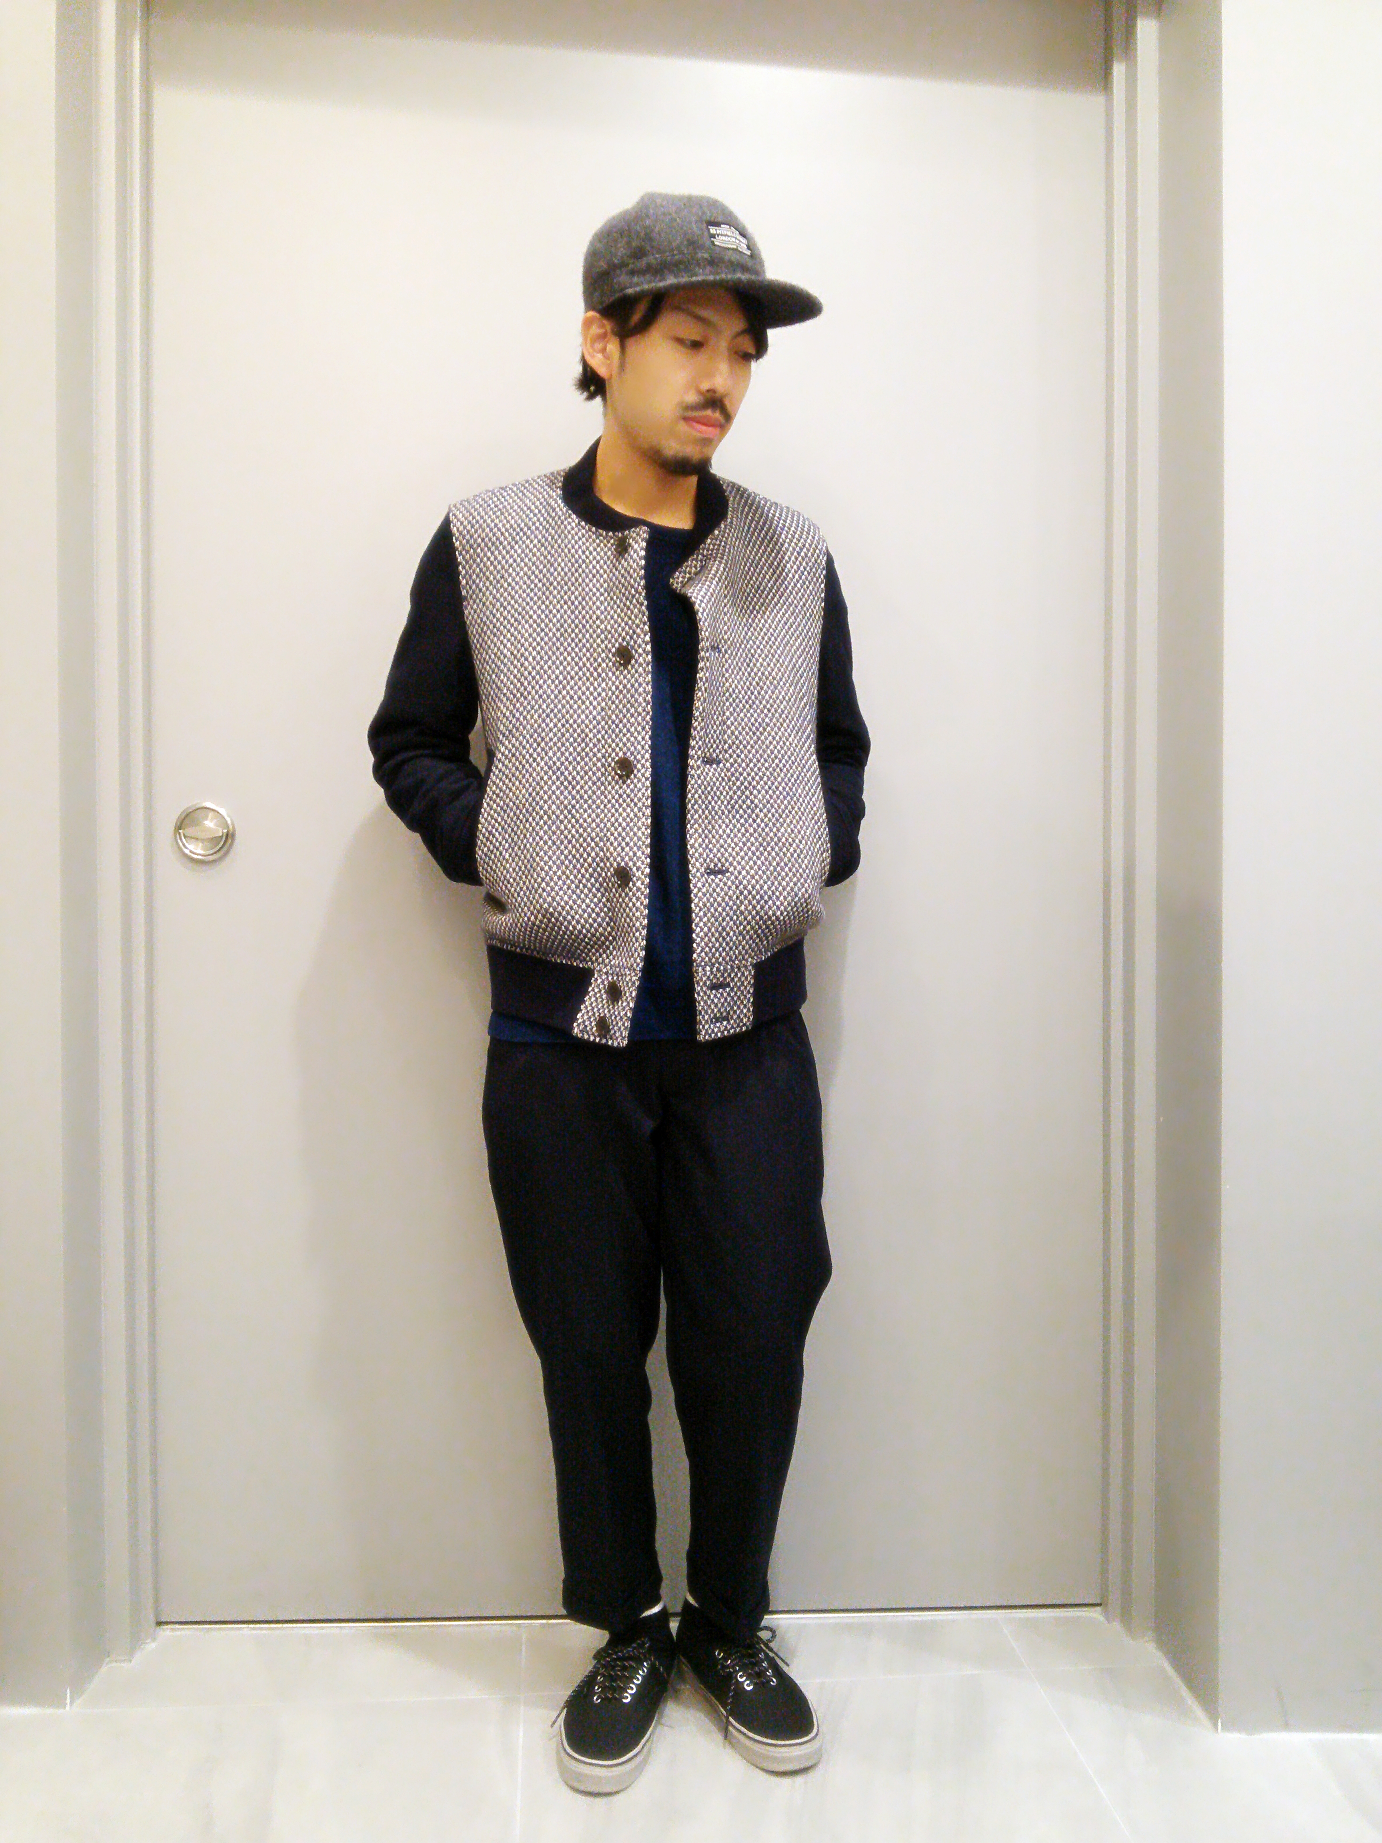 tadium-jumper-dressing-important-5-12